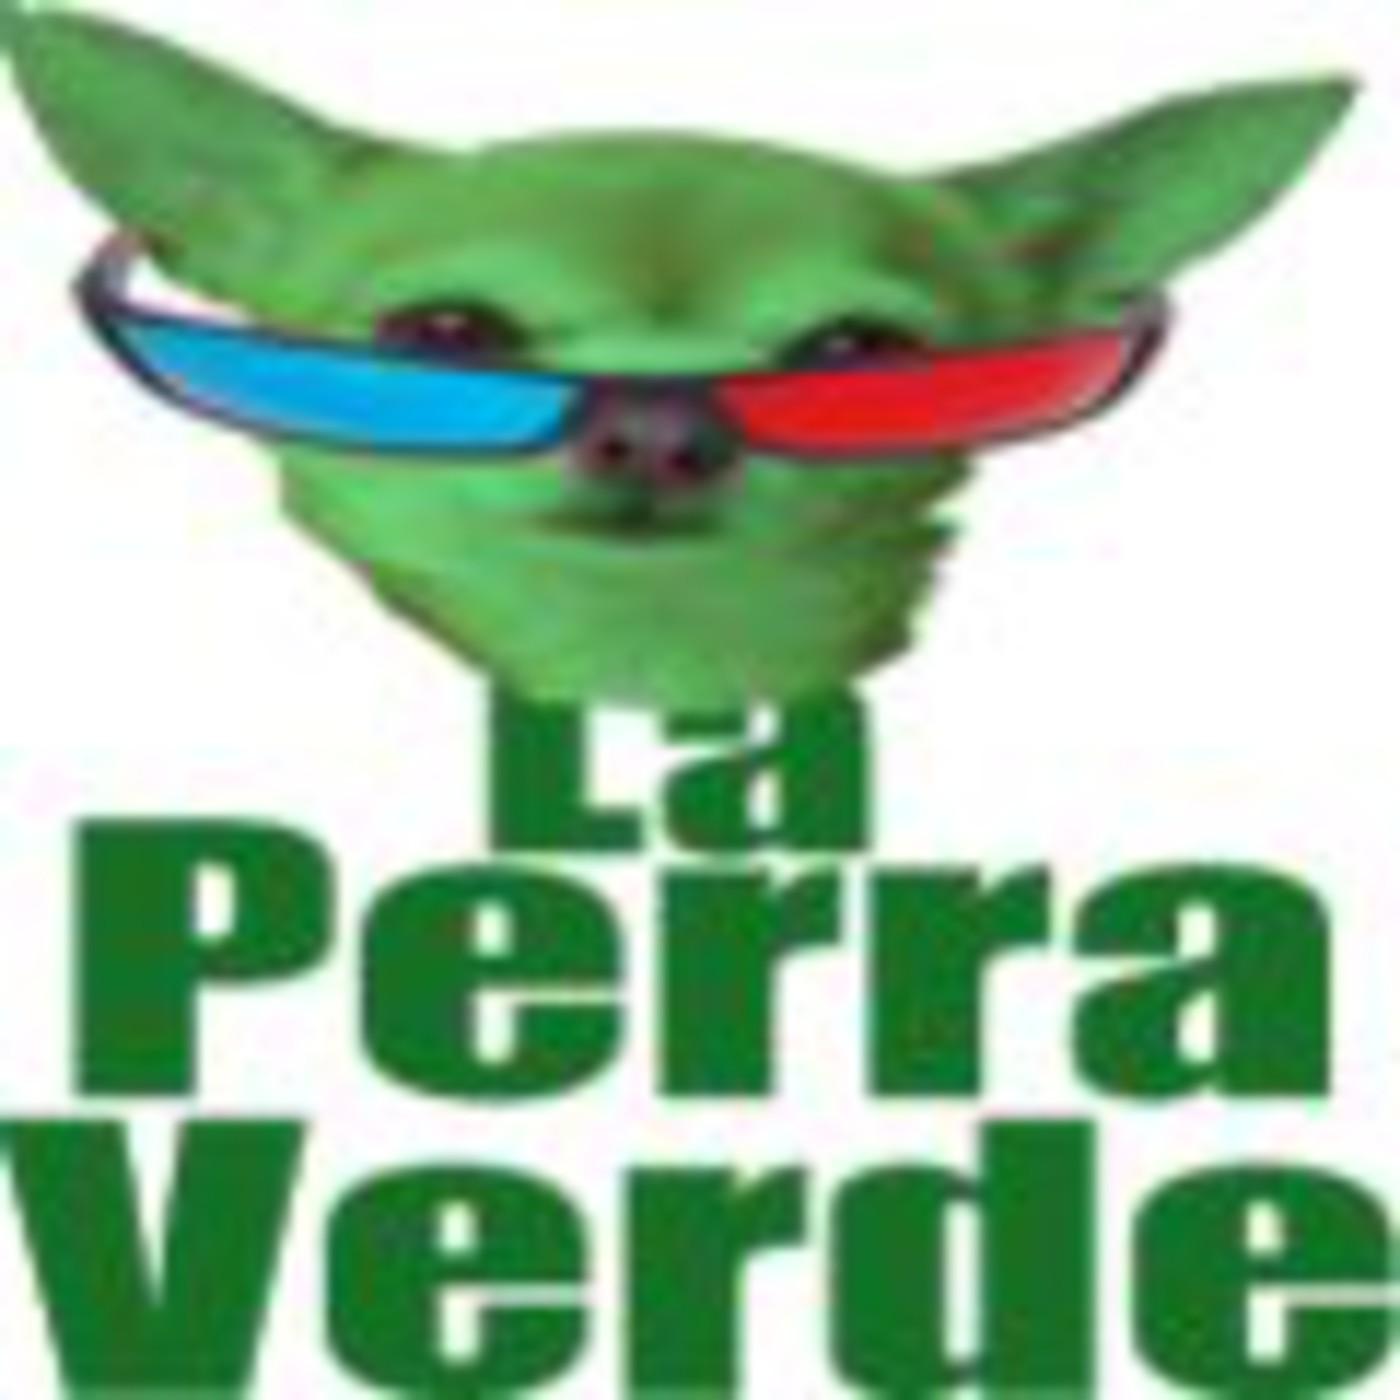 La Perra Verde